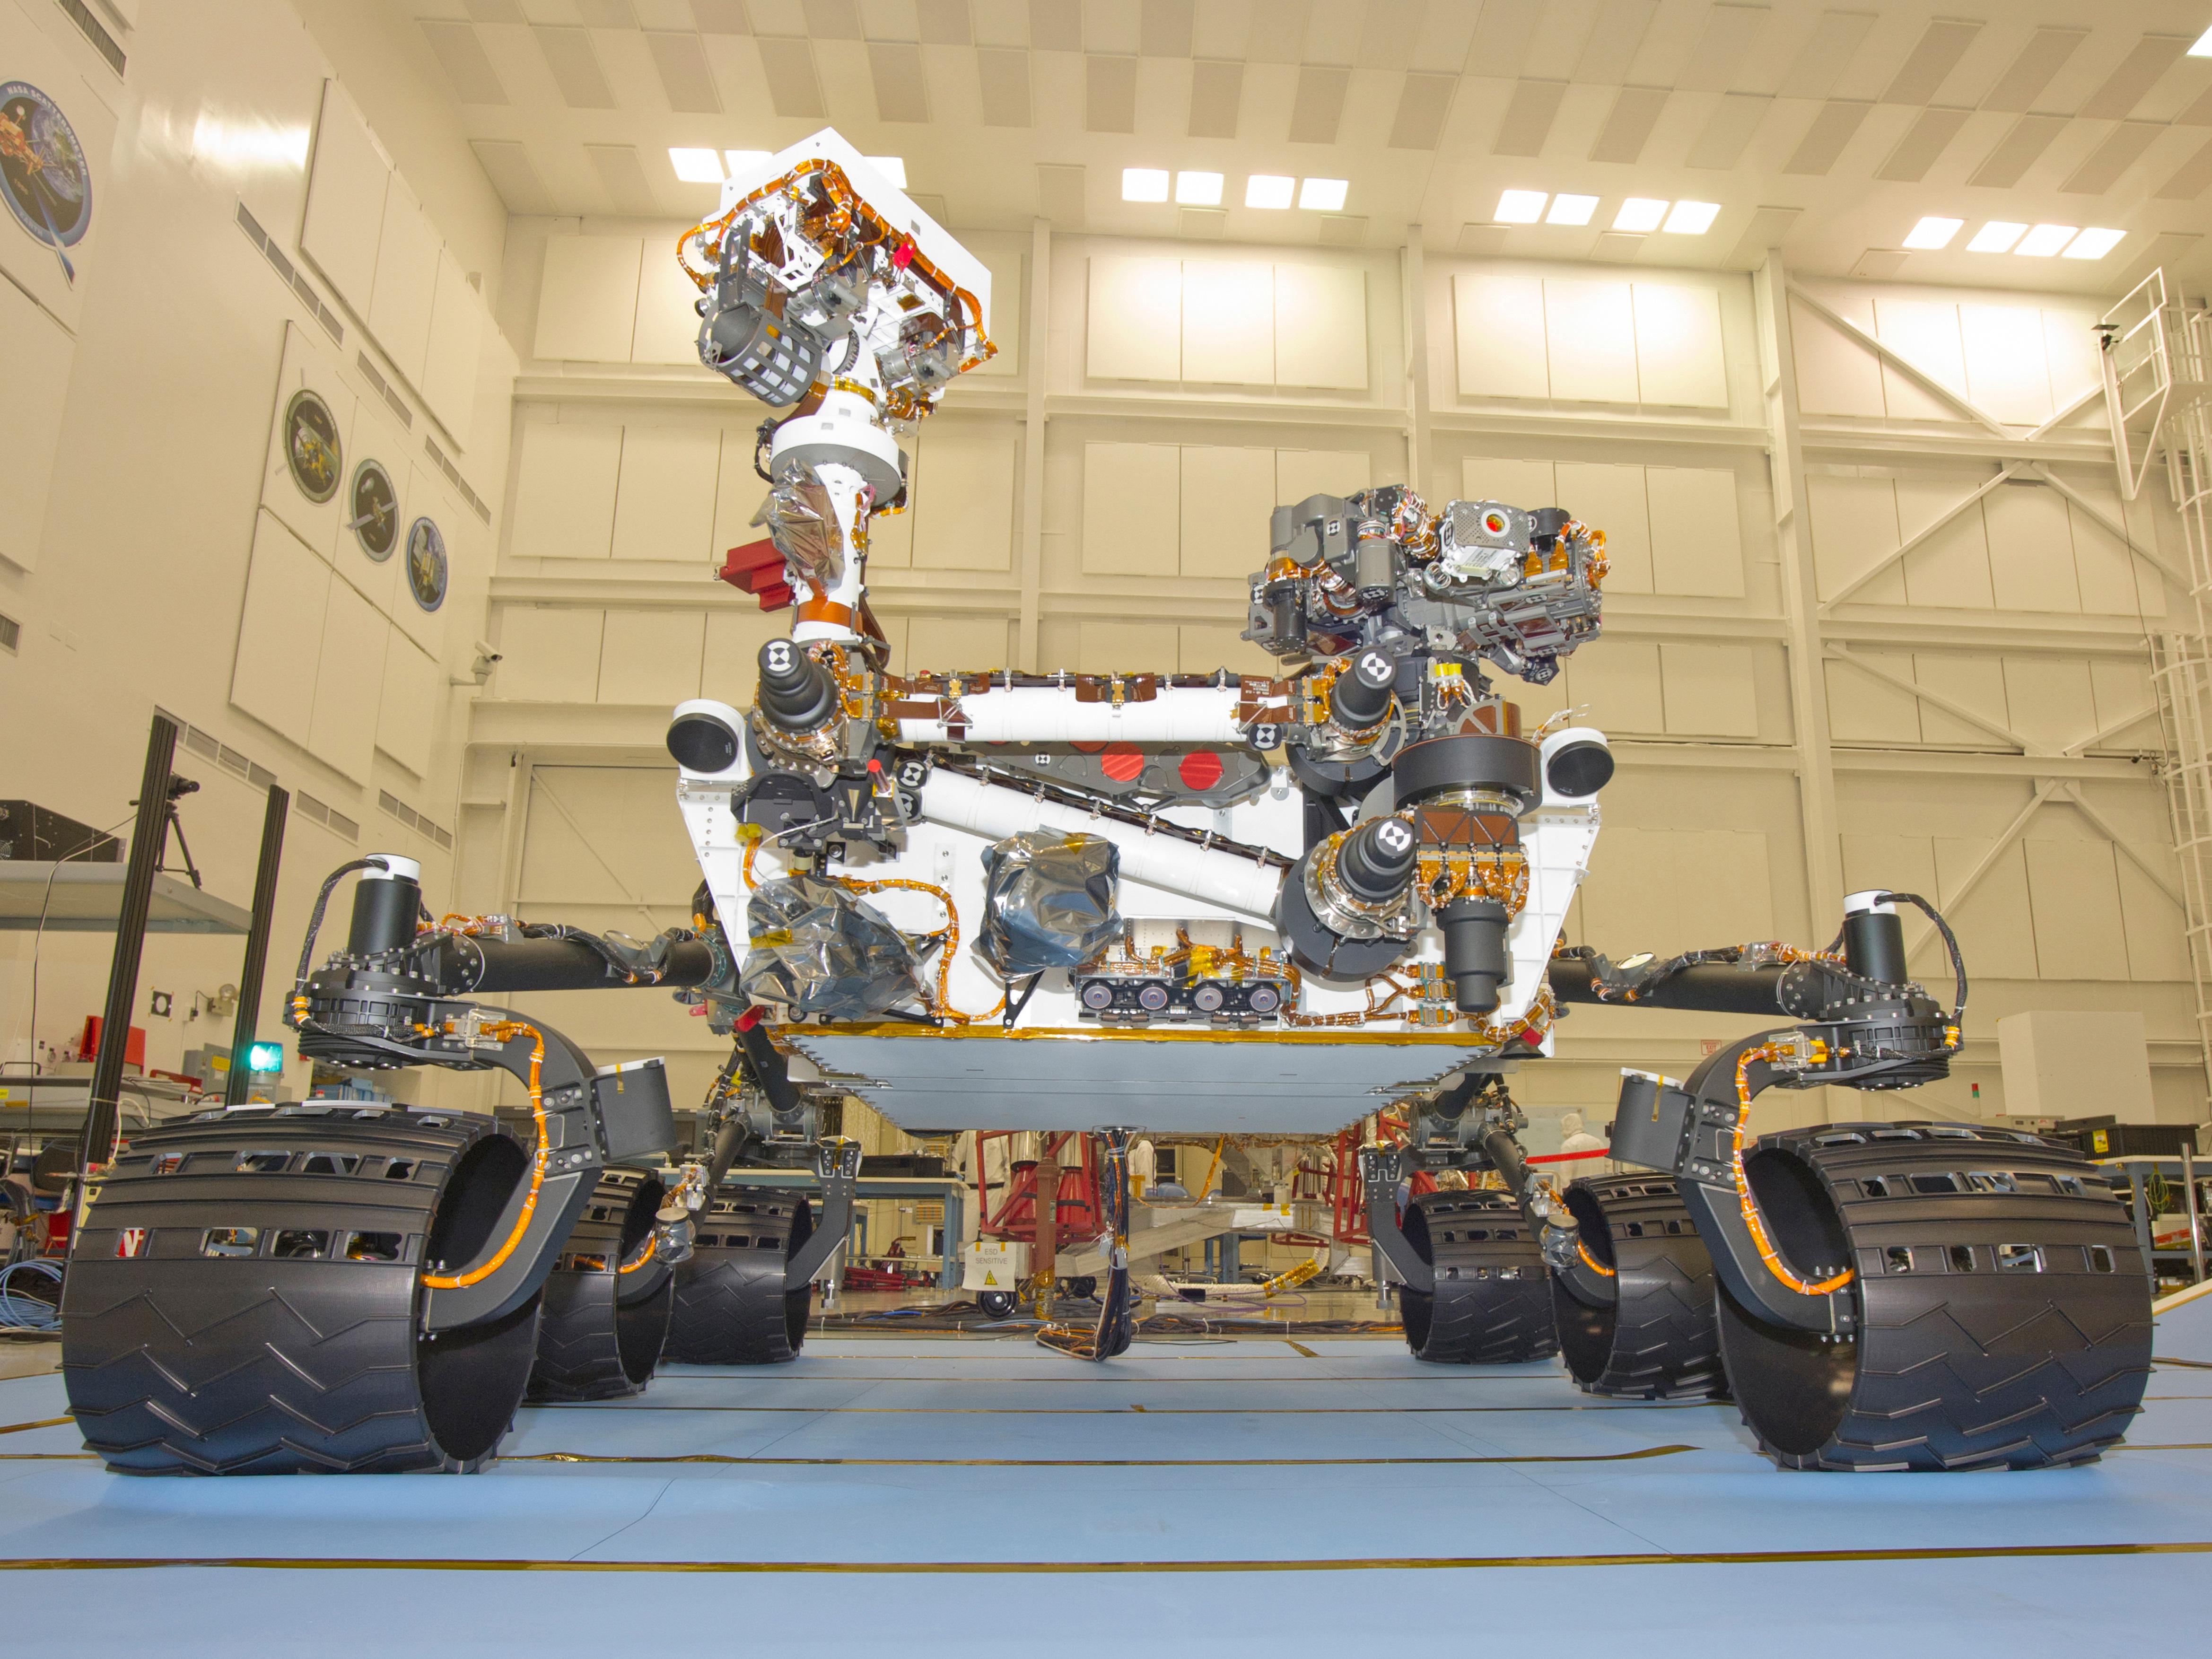 curiostiy mission space - photo #16